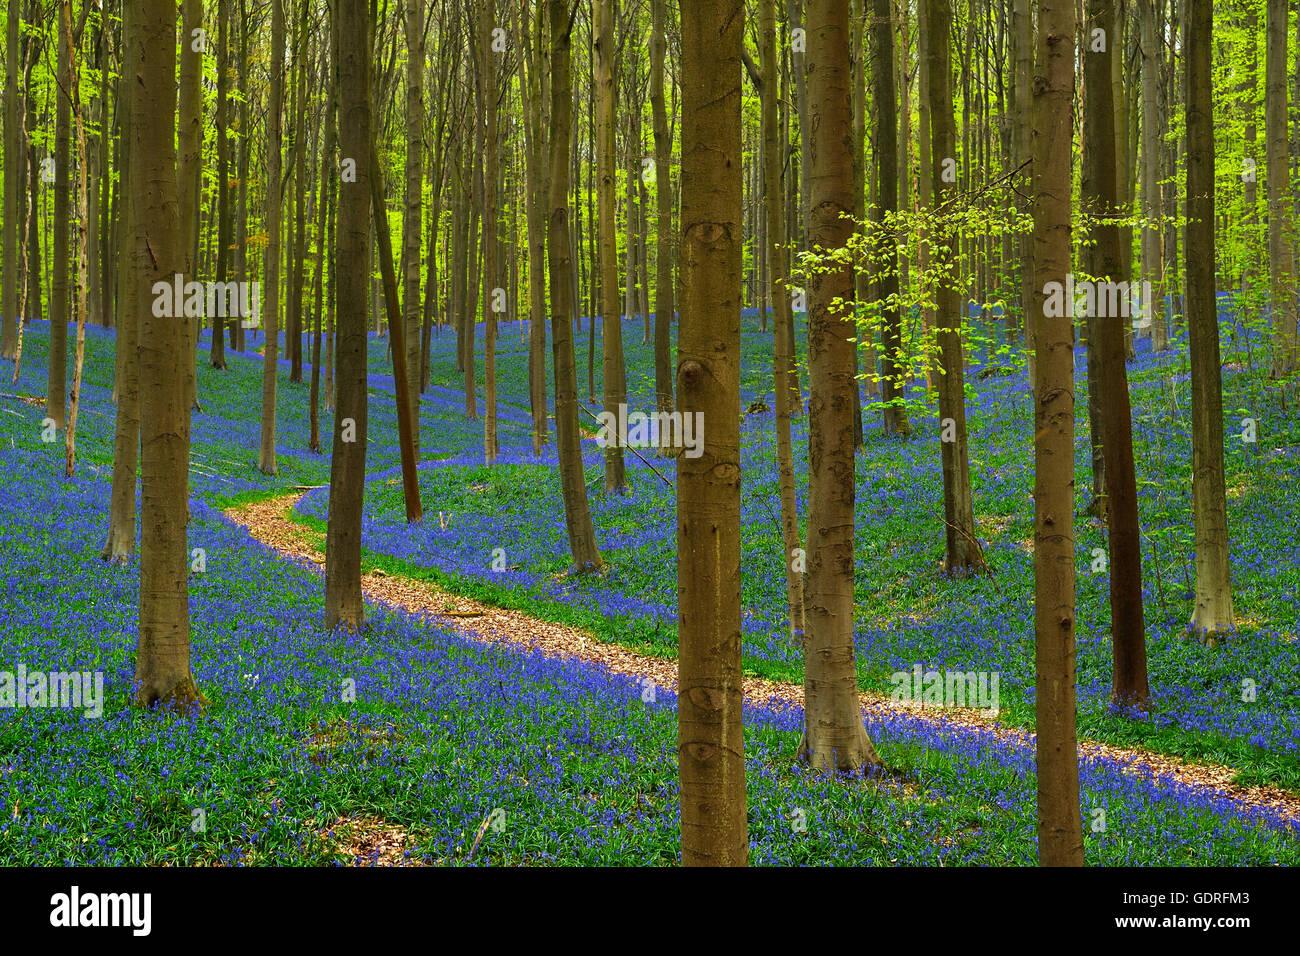 Waldweg, europäische Buche (Fagus Sylvatica), Glockenblumen (Hyacinthoides), Hallerbos, Vlaams-Brabant, Belgien Stockbild